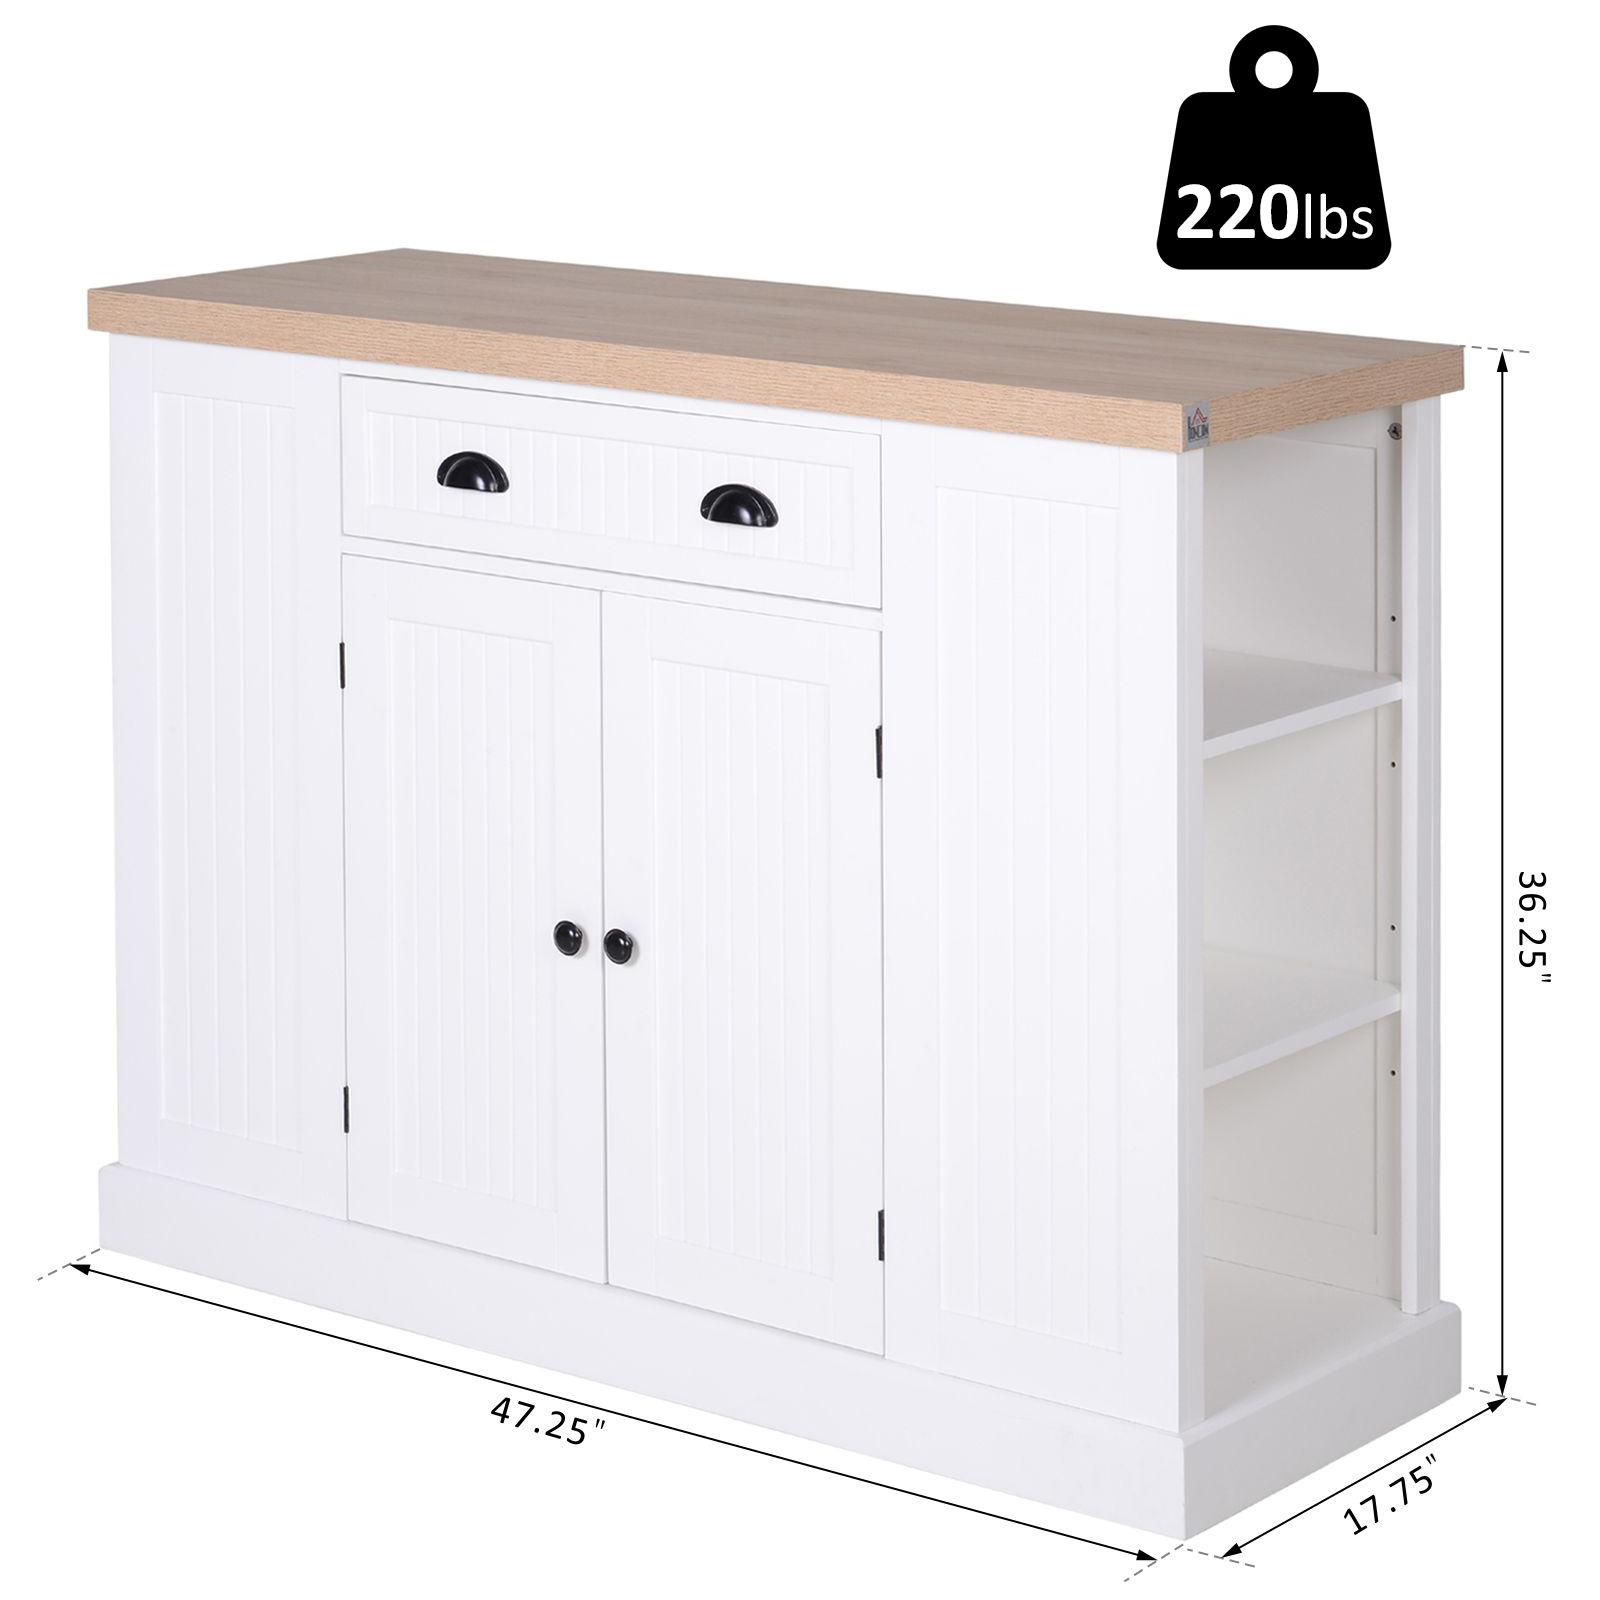 Wooden Kitchen Island Storage Cabinet with Drawer Shelving ...